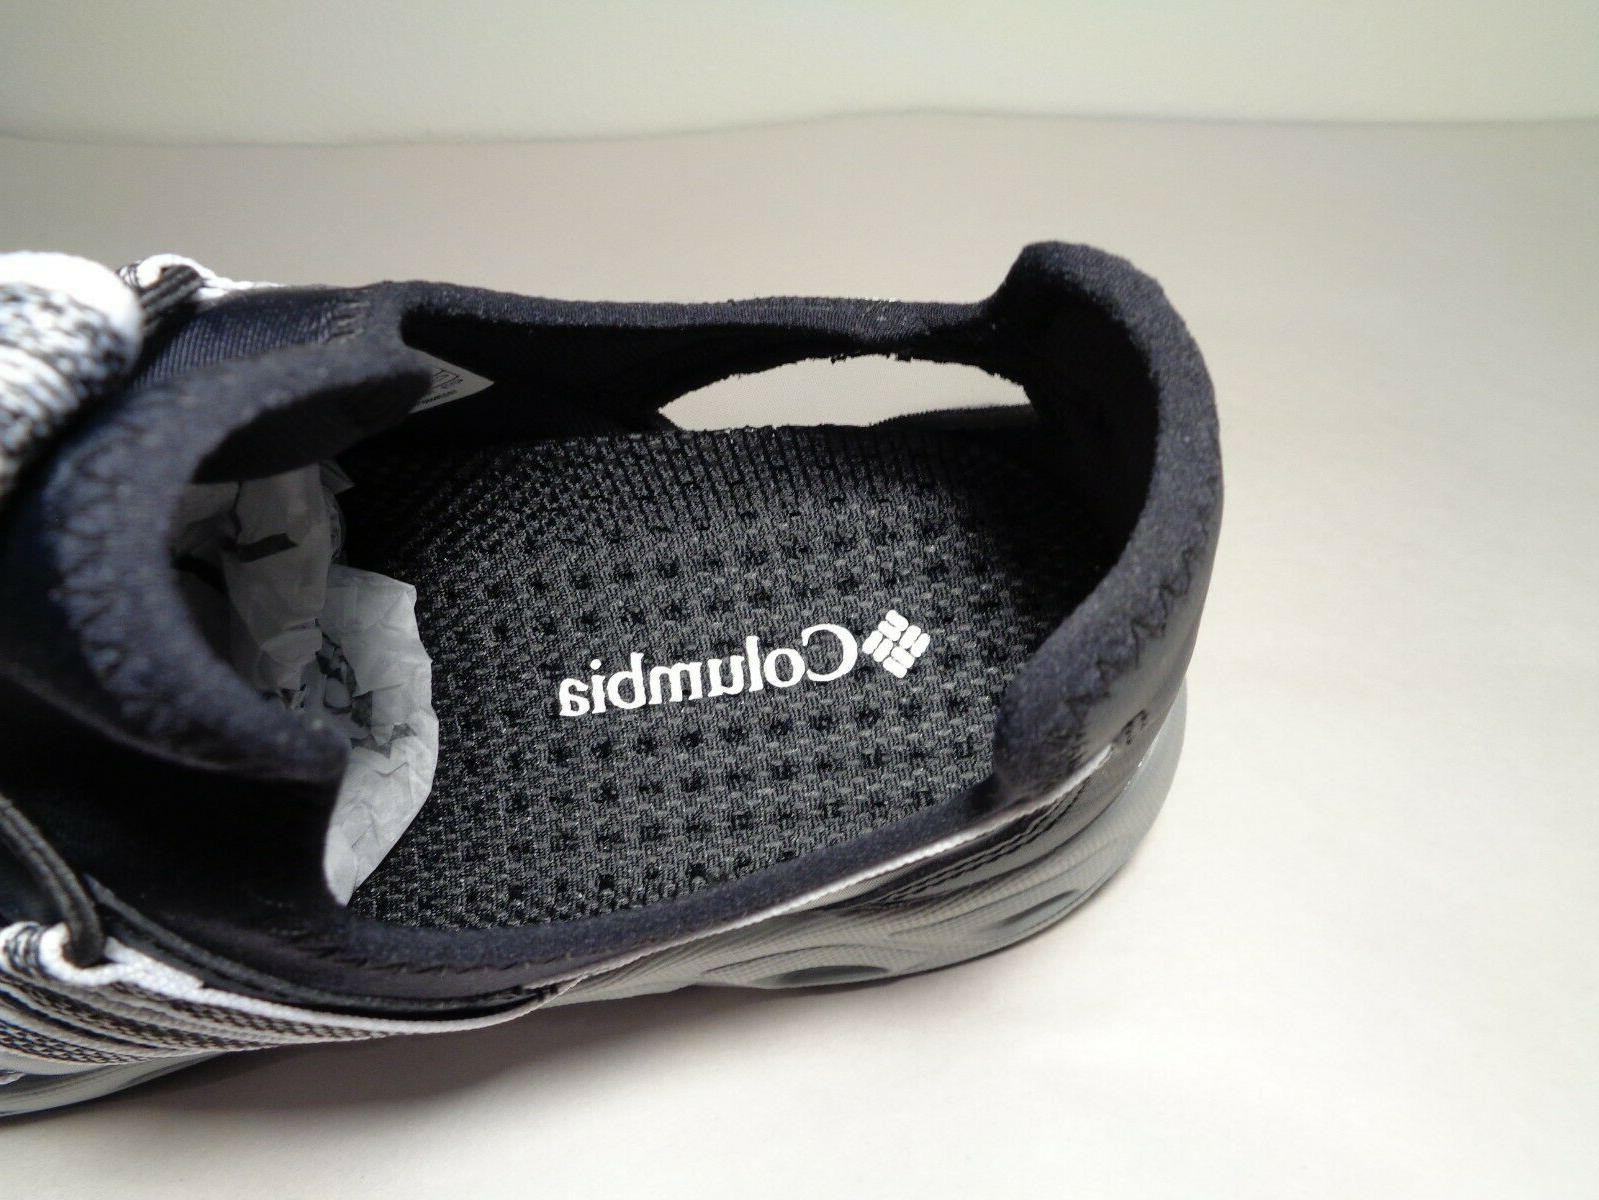 Columbia Size 11 OKOLONA Black White Toggle Sneakers New Shoes